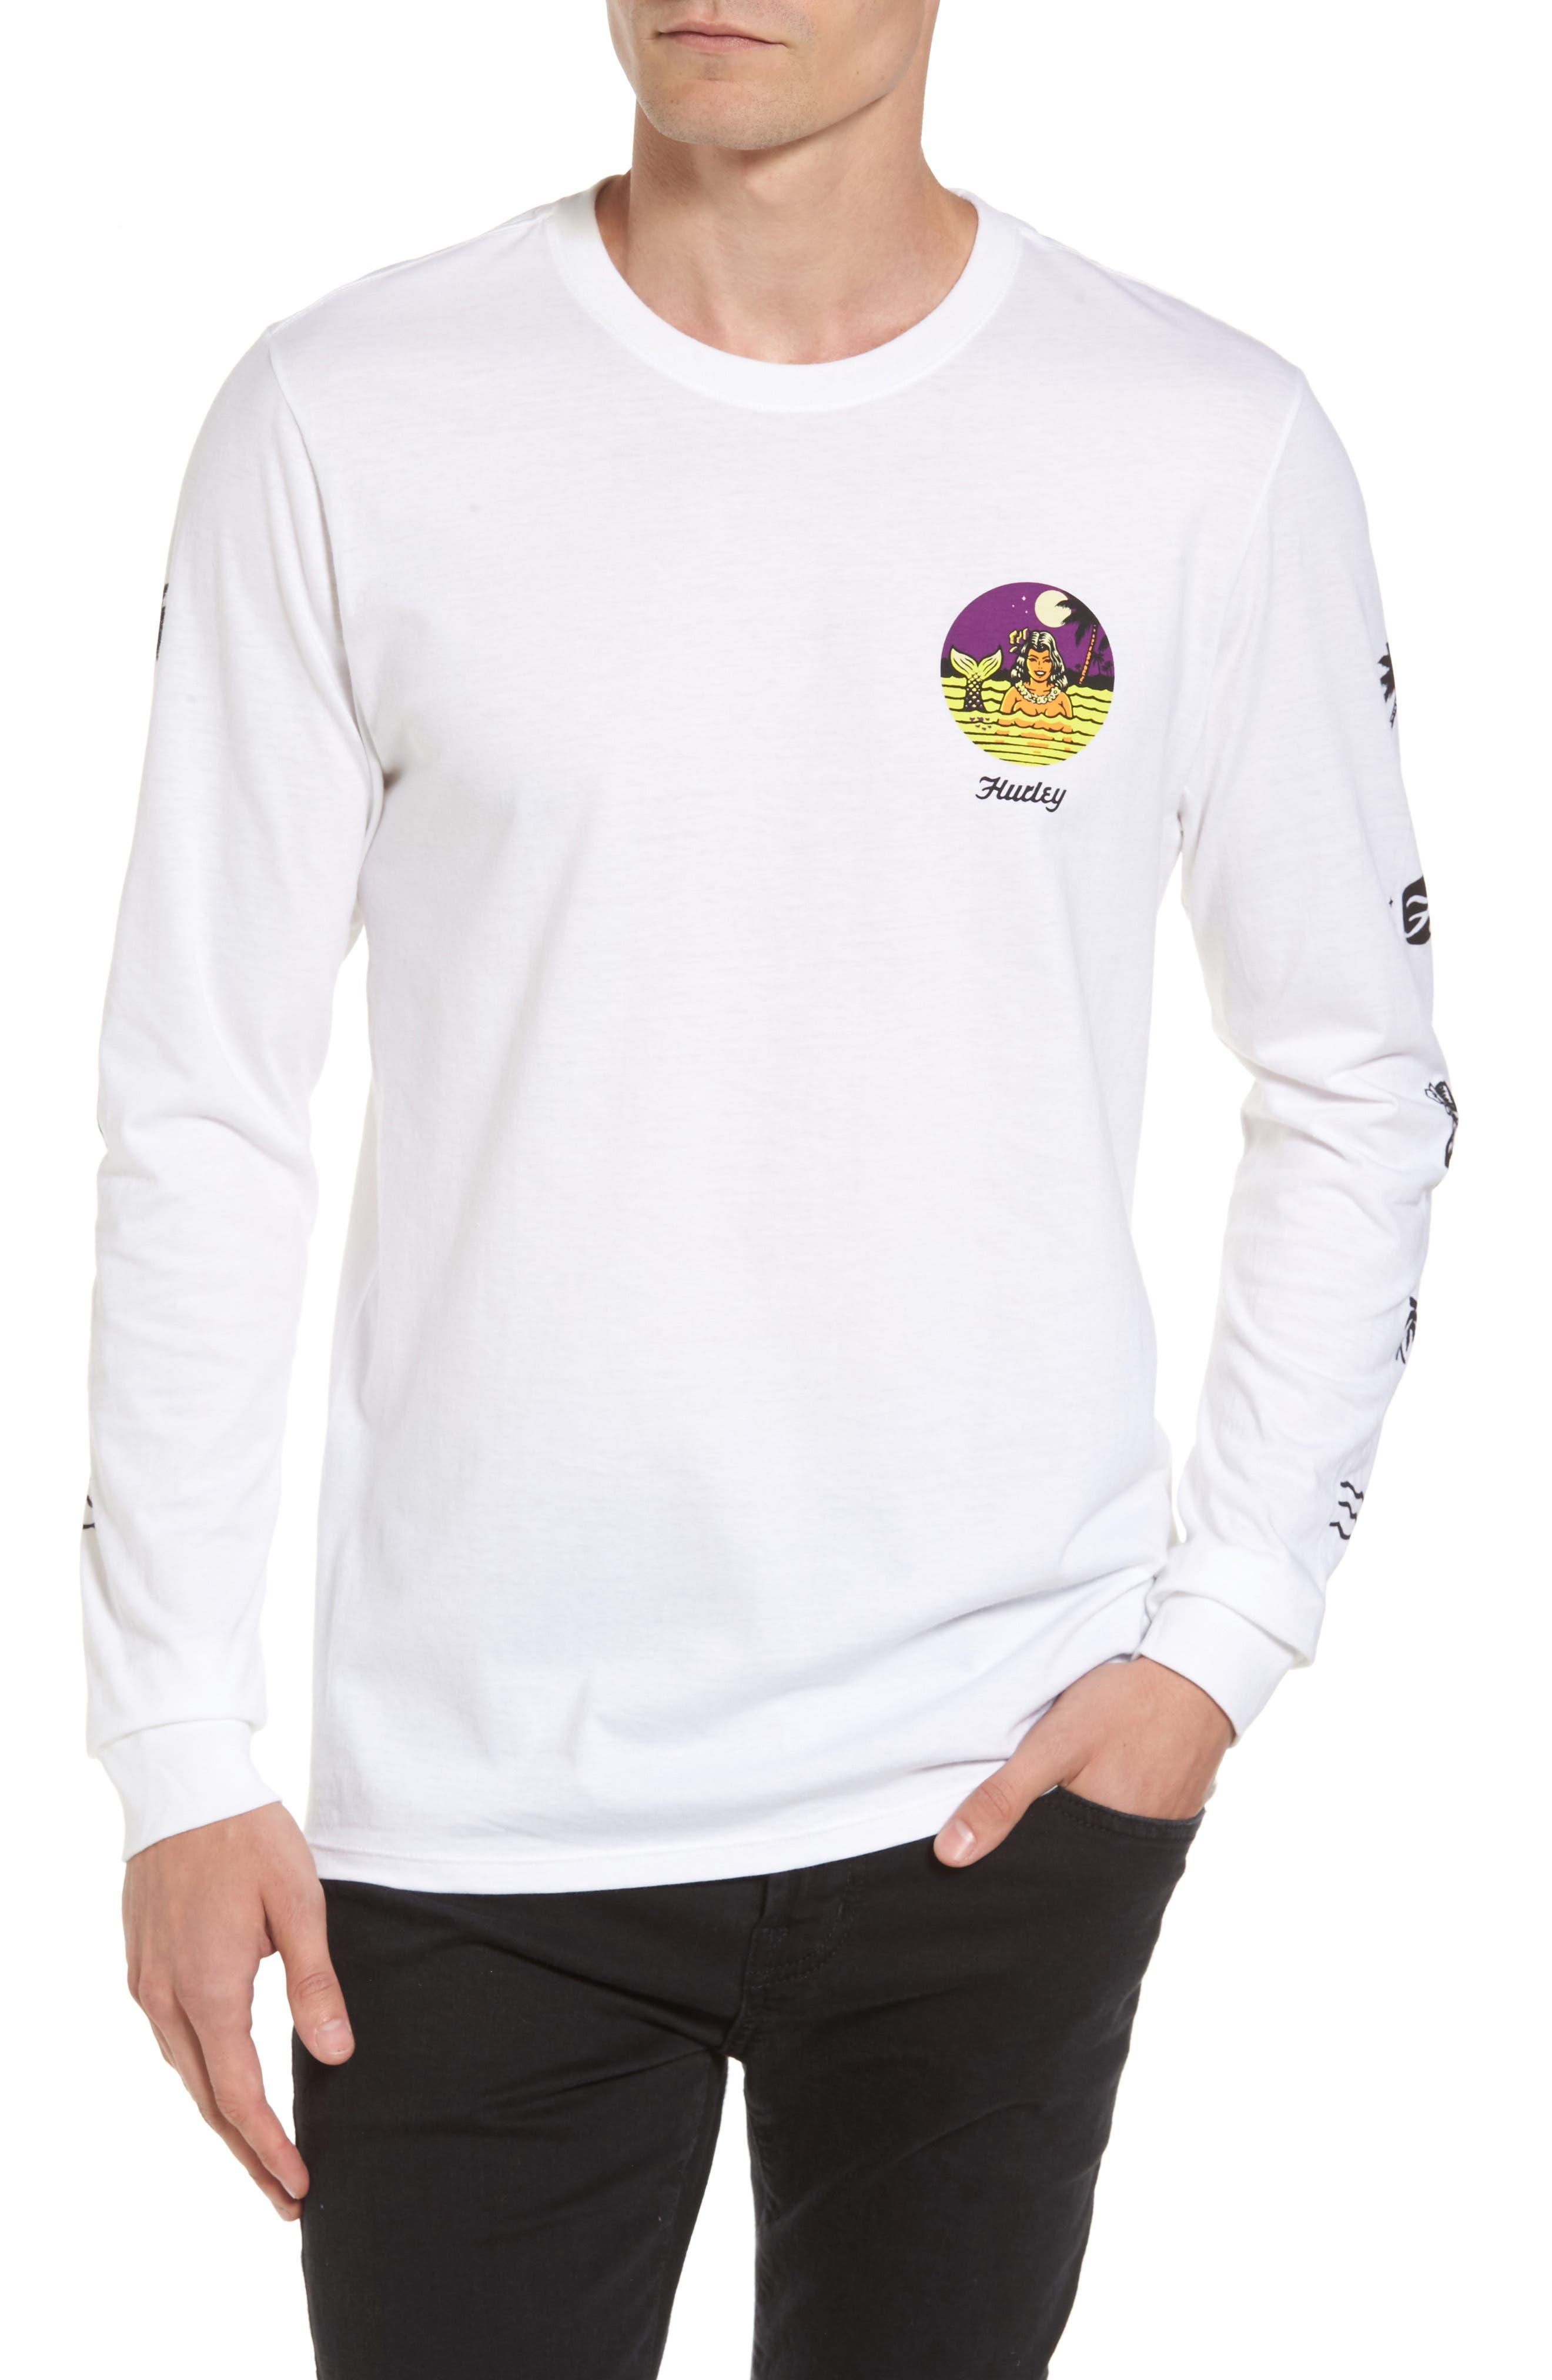 Hurley Sirena T-Shirt